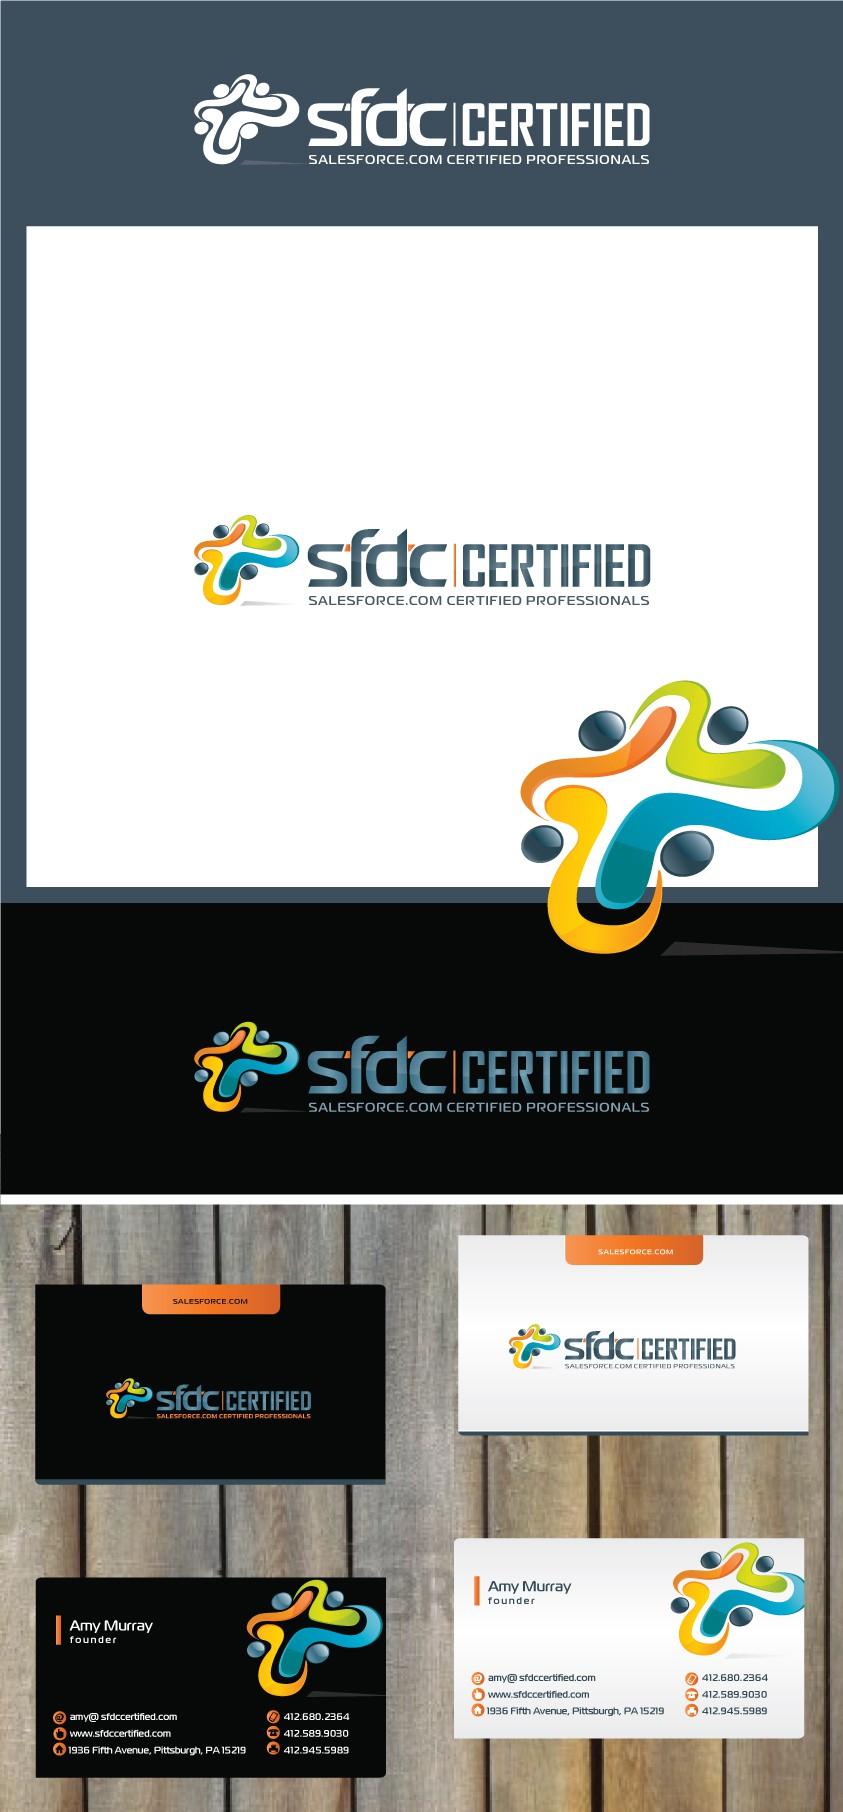 SFDC Certified needs a new logo